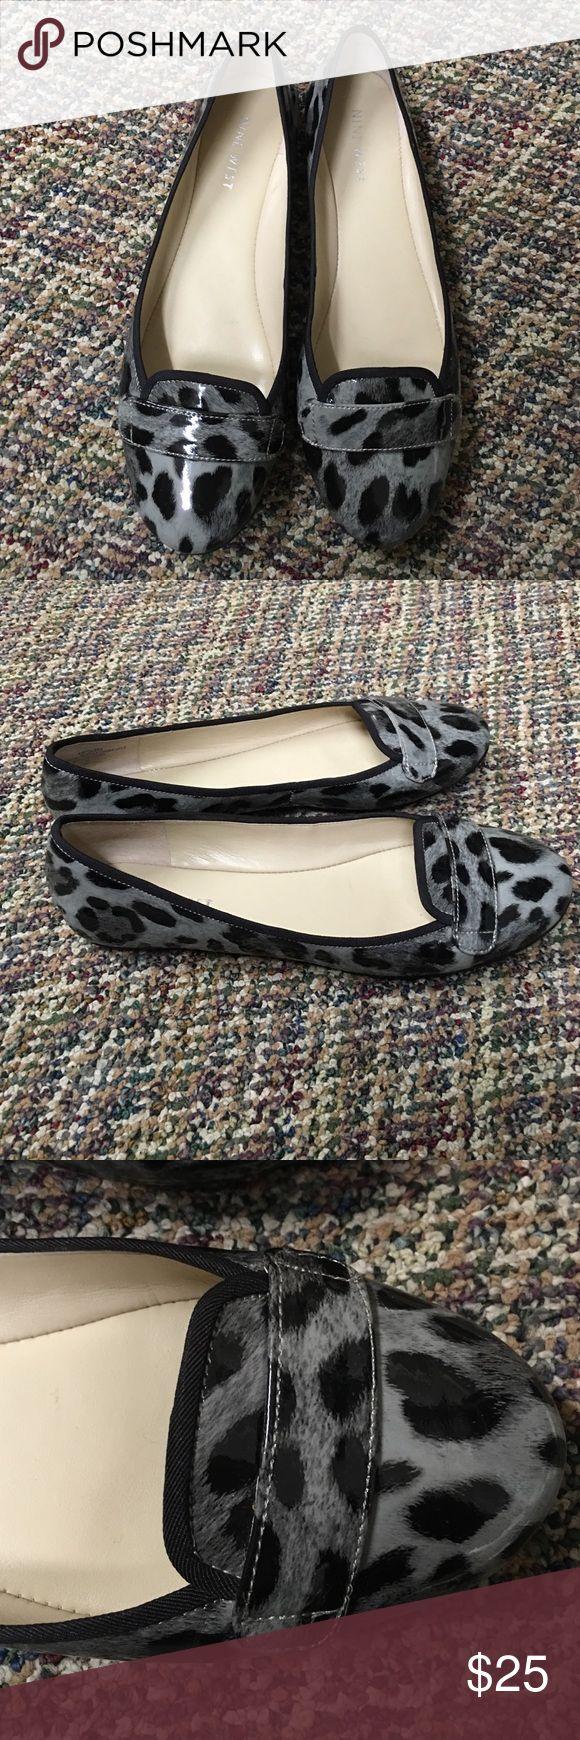 Nine West cheetah flats size 6 Nine West cheetah flats size 6 Nine West Shoes Flats & Loafers